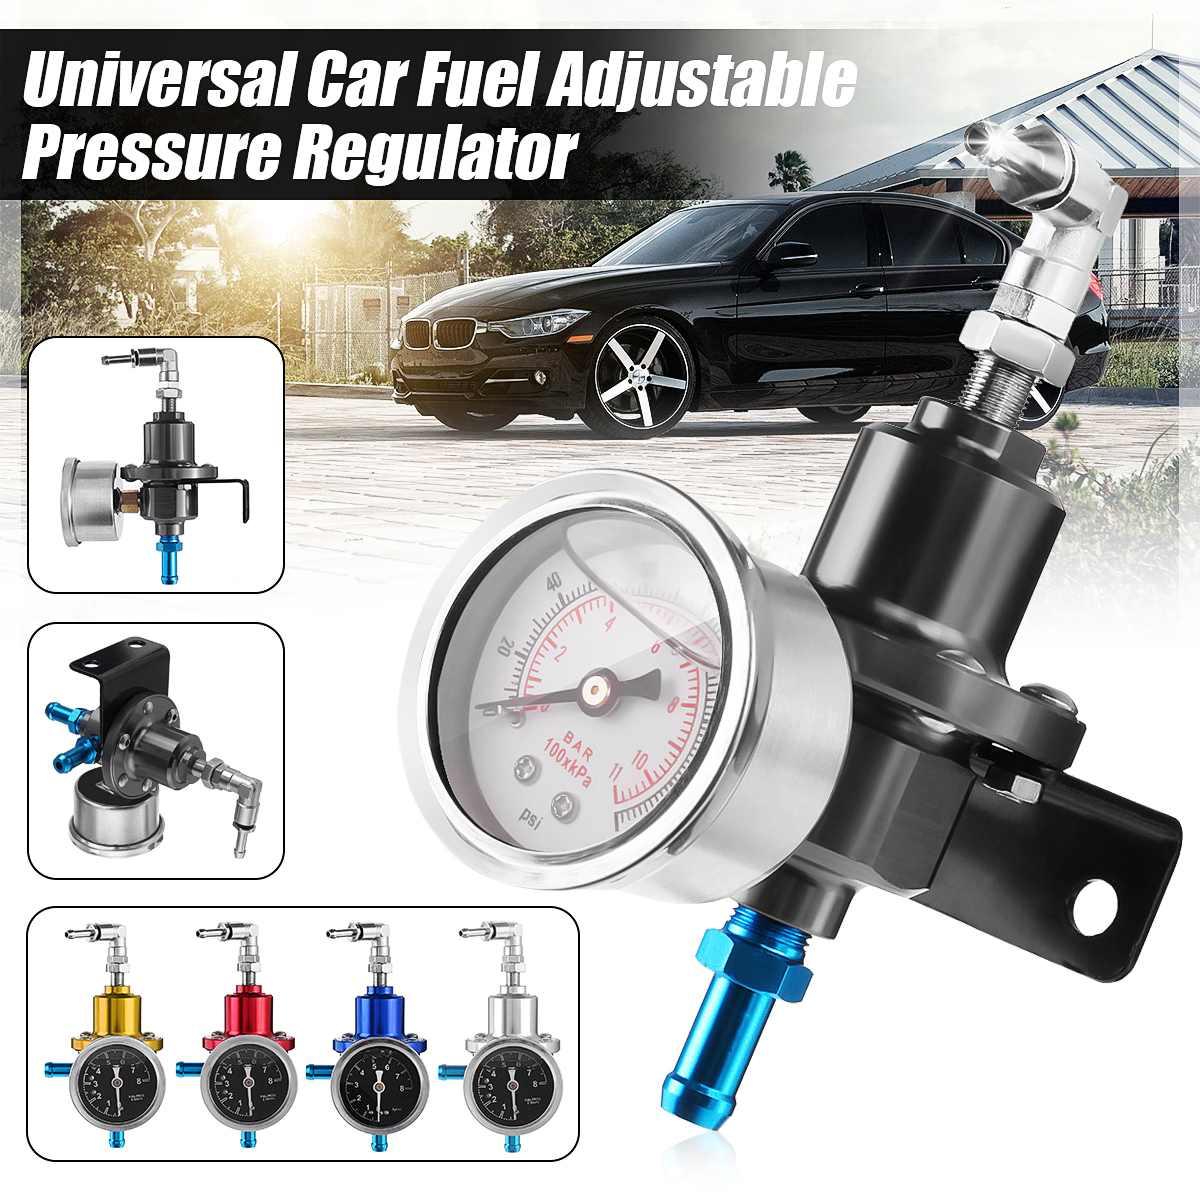 Universal Car Adjustable Fuel Pressure Regulator With Gauge Kit Aluminum Red/Blue/Gold/Silver/Black/Titanium